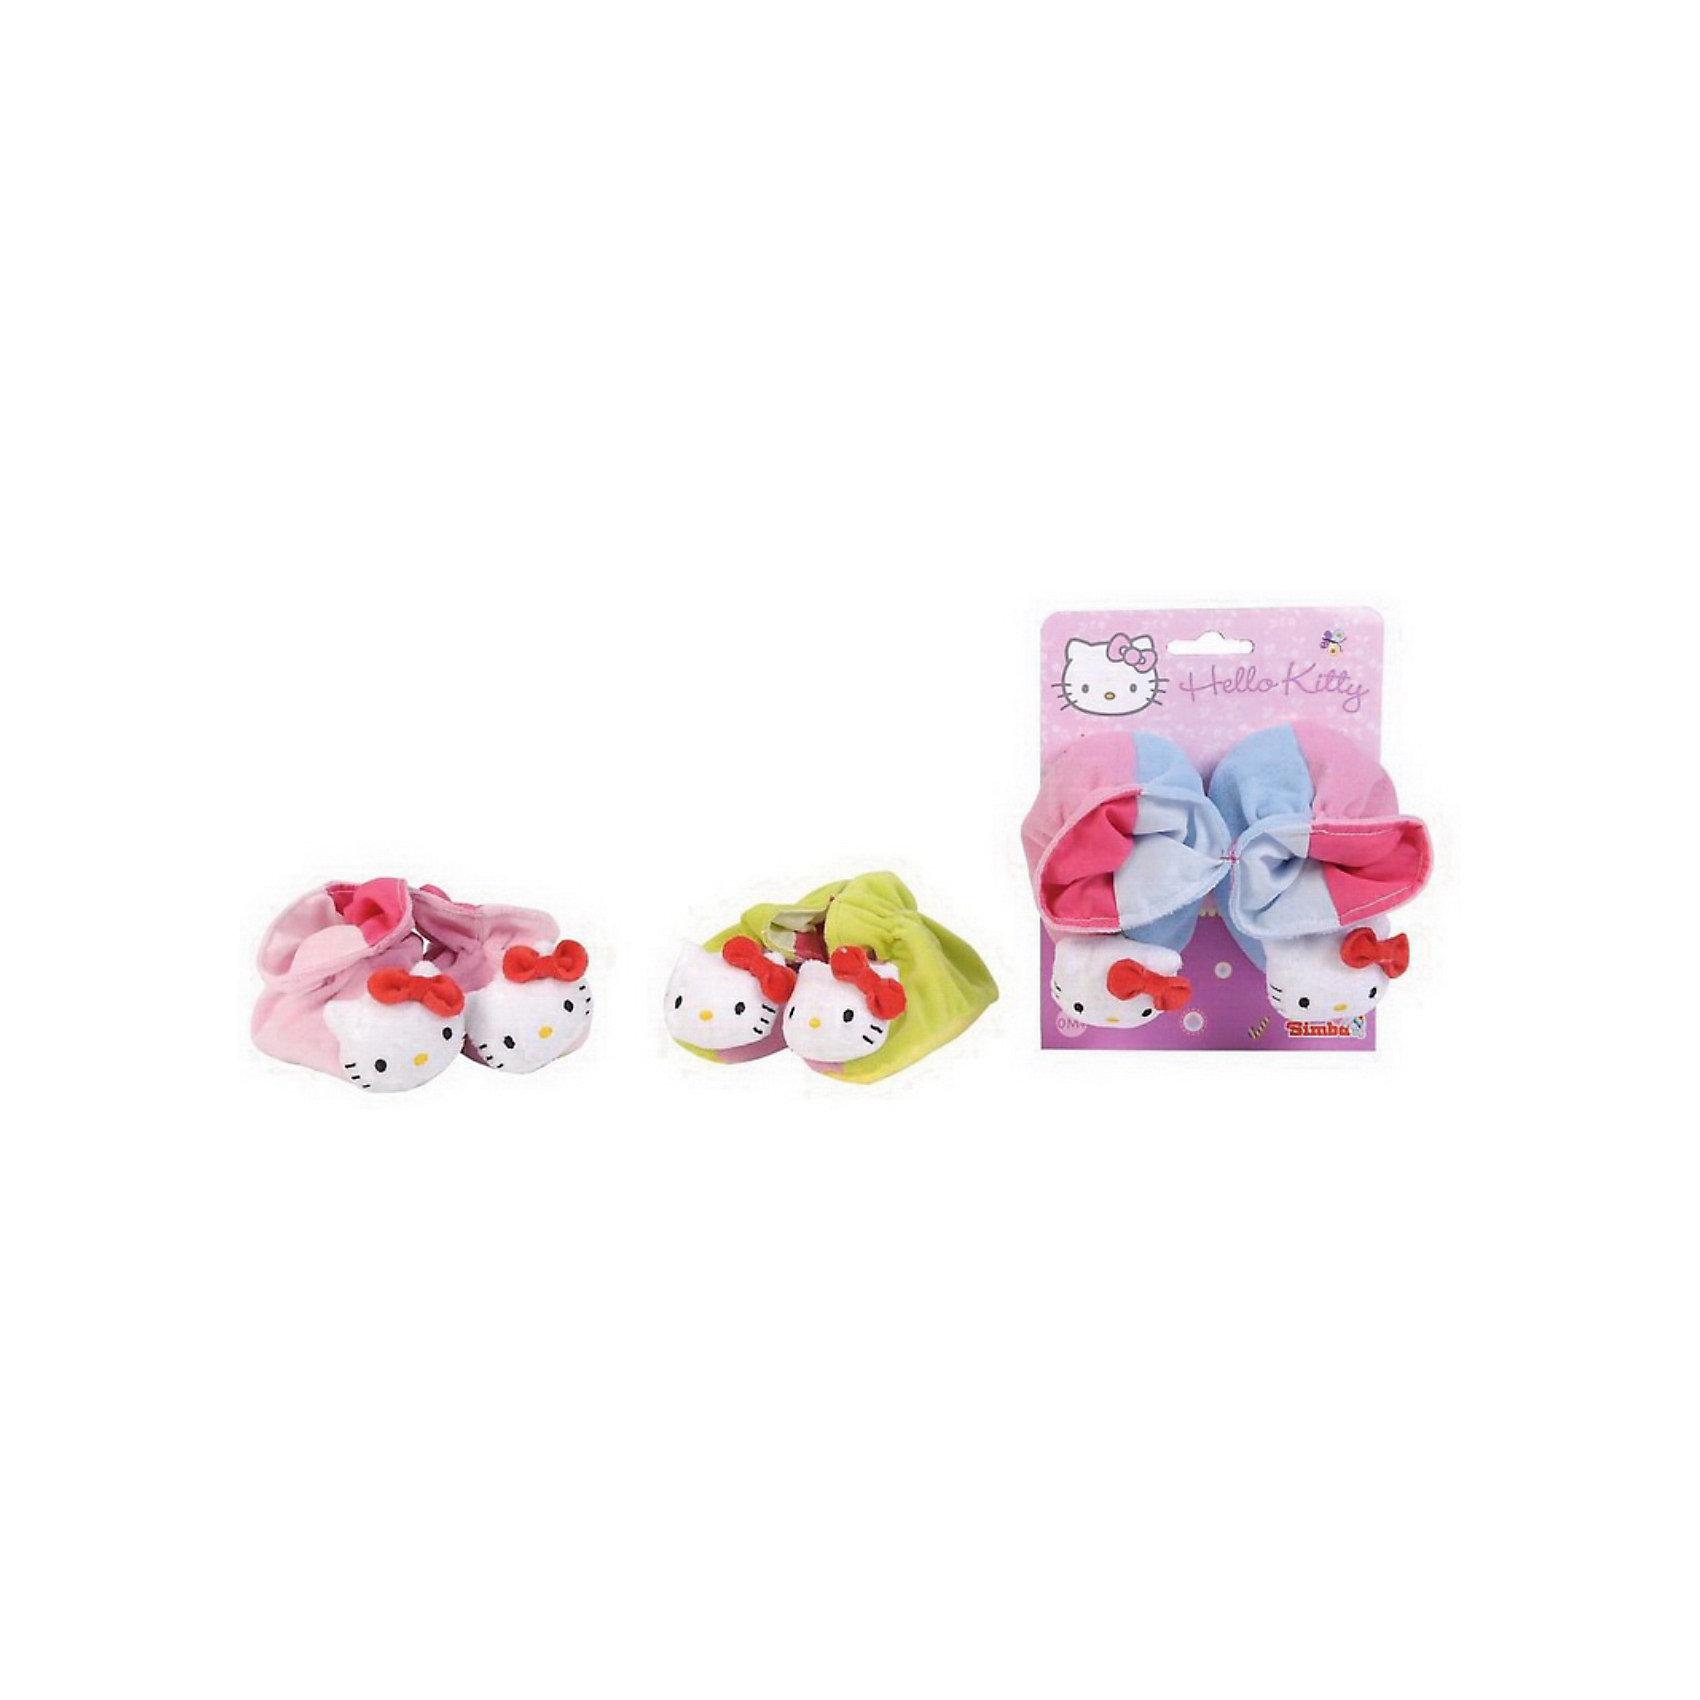 Simba Hello Kitty Тапочки-погремушки, размер 13 см, от 0-го месяца simba simba губная гармошка hello kitty